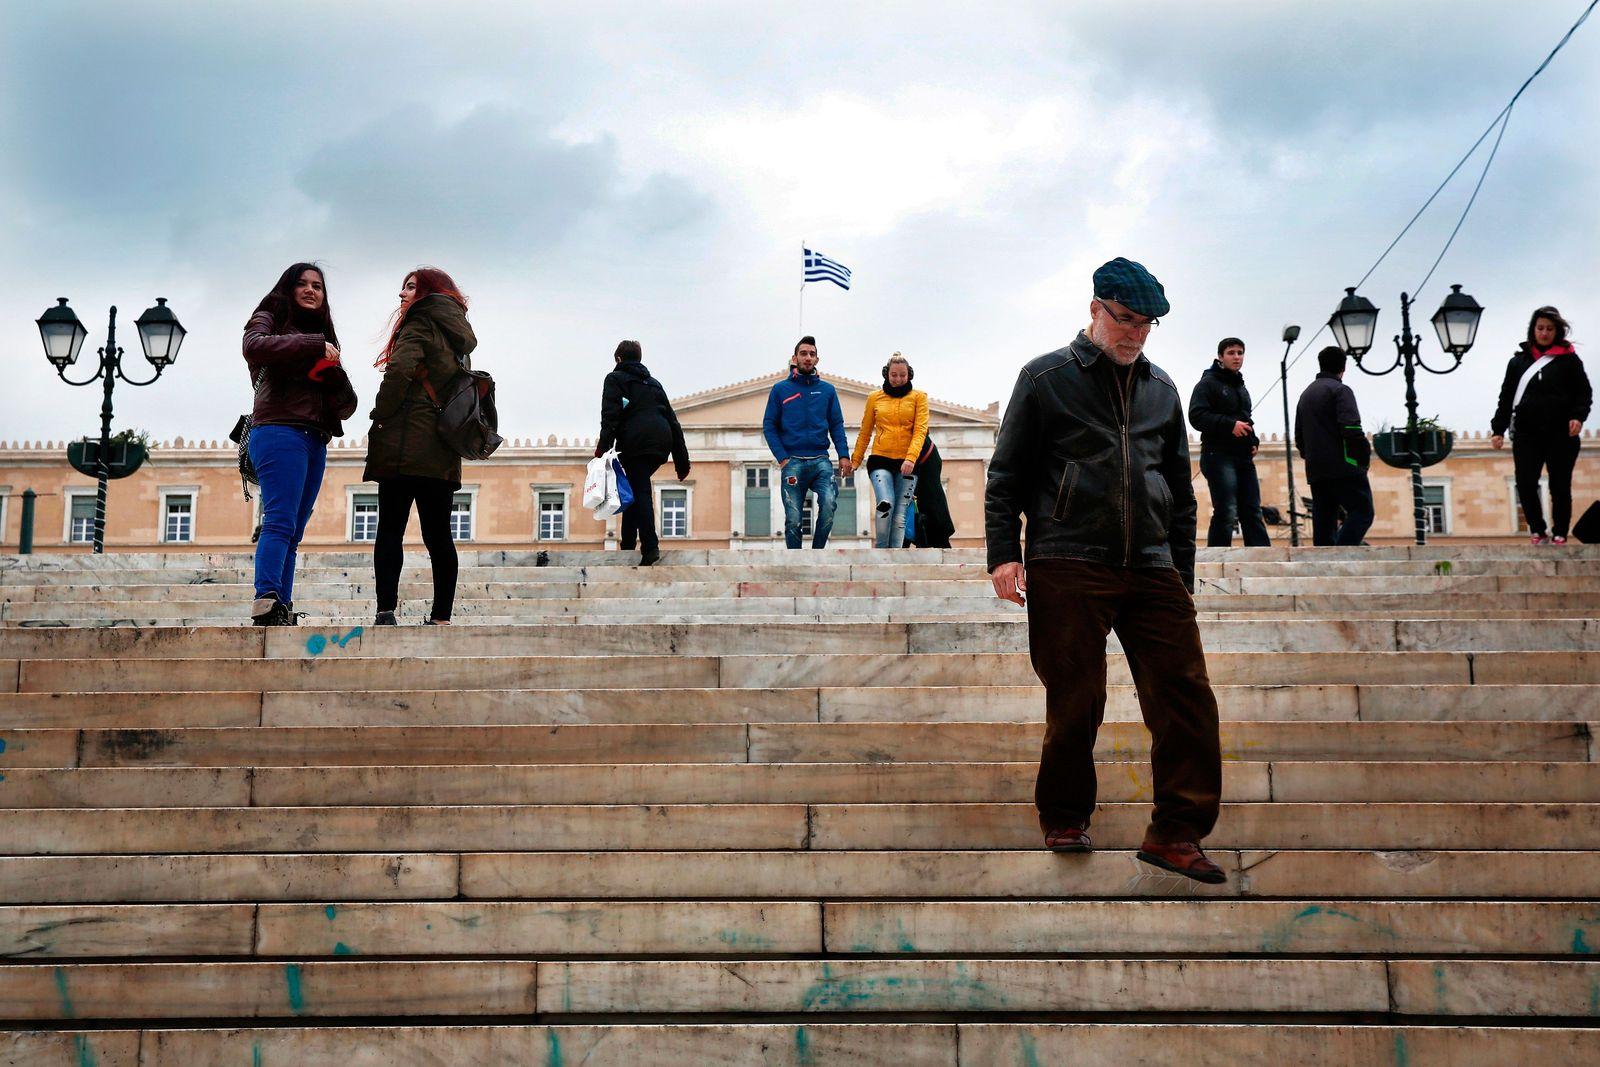 Griechenland / Finanzkrise / Parlament / Konjunktur / Euro-Länder